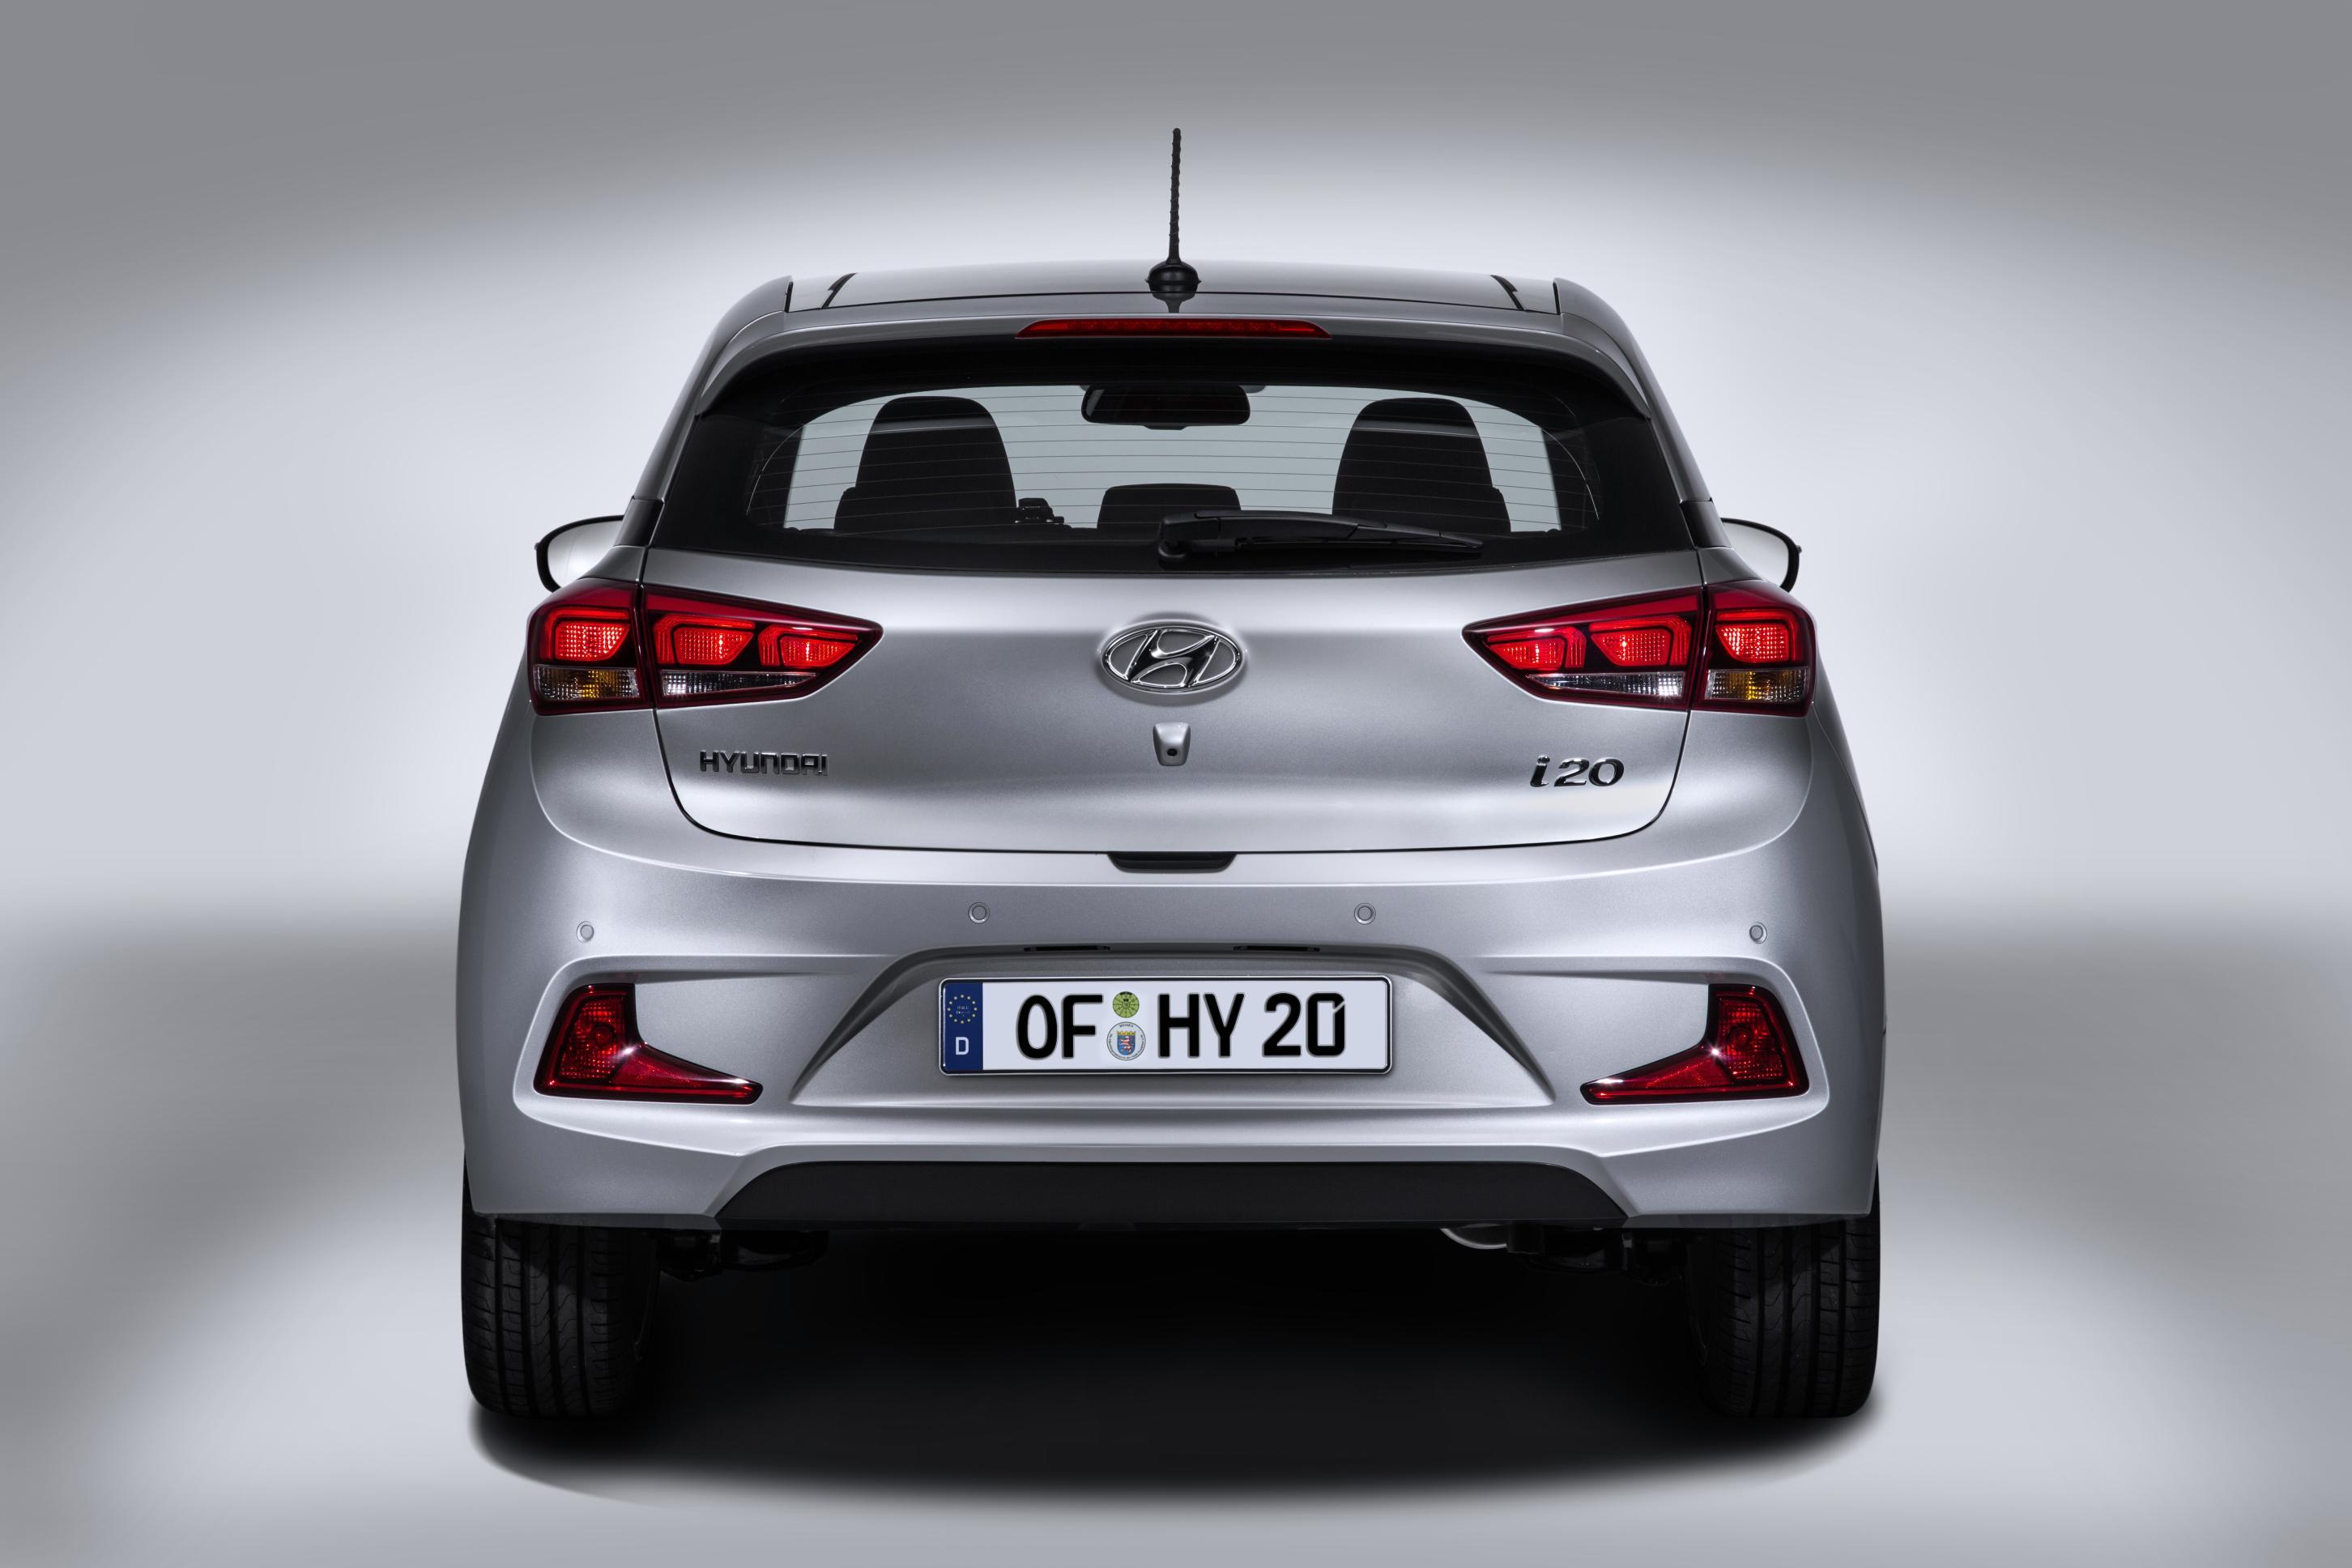 hyundai officially unveils i20 coupe with unique design autoevolution. Black Bedroom Furniture Sets. Home Design Ideas